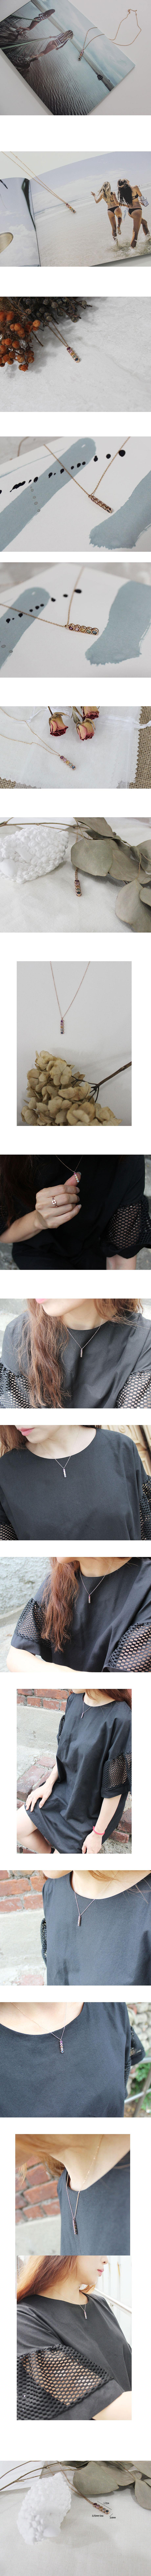 14k 핑크골드 멀티 사파이어 라인 목걸이 - 안즈, 368,000원, 골드, 14K/18K